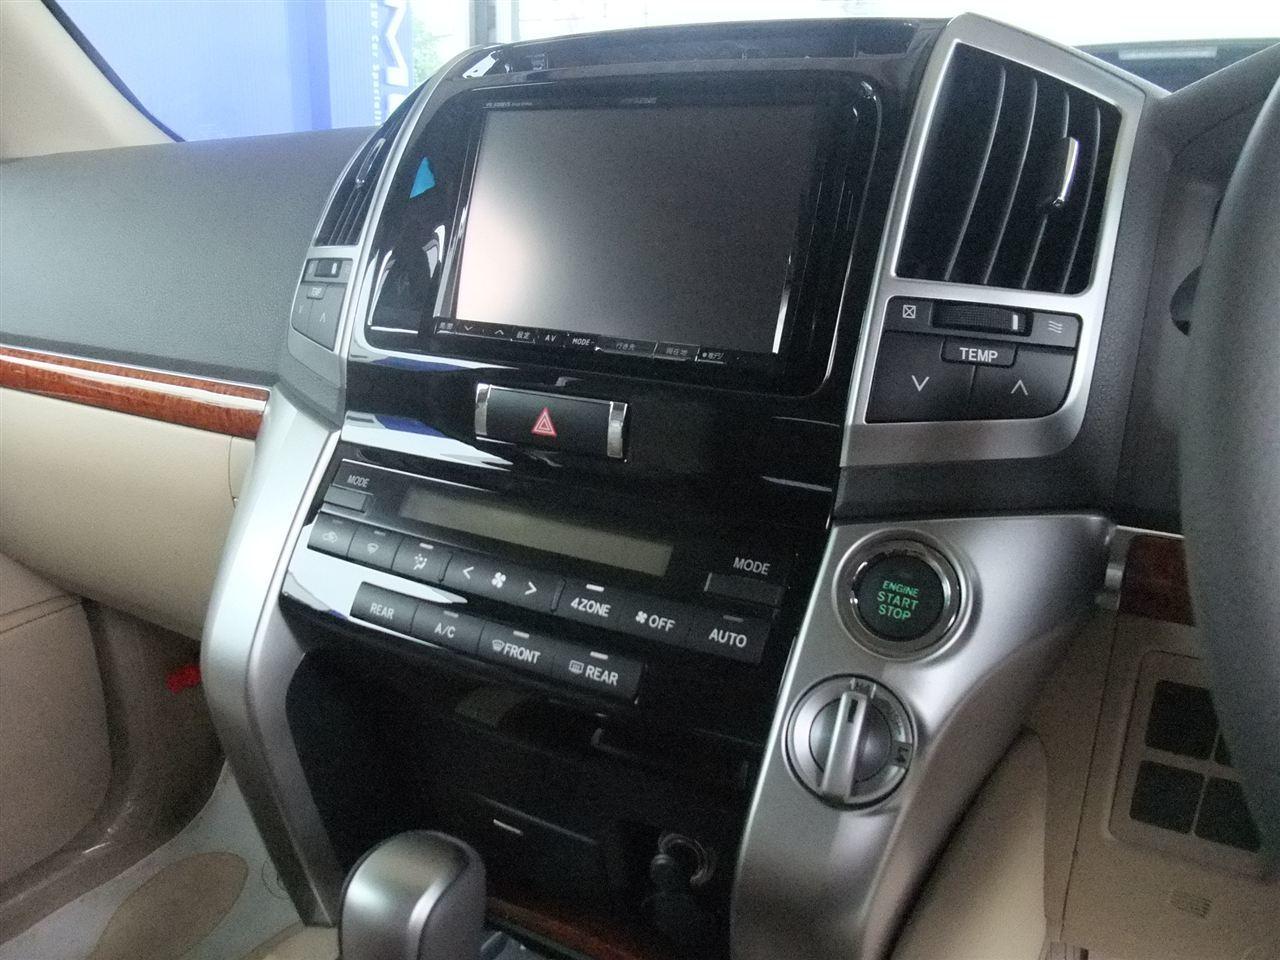 2DIN + Адаптер Toyota Landcruiser 200 (2010-2011)